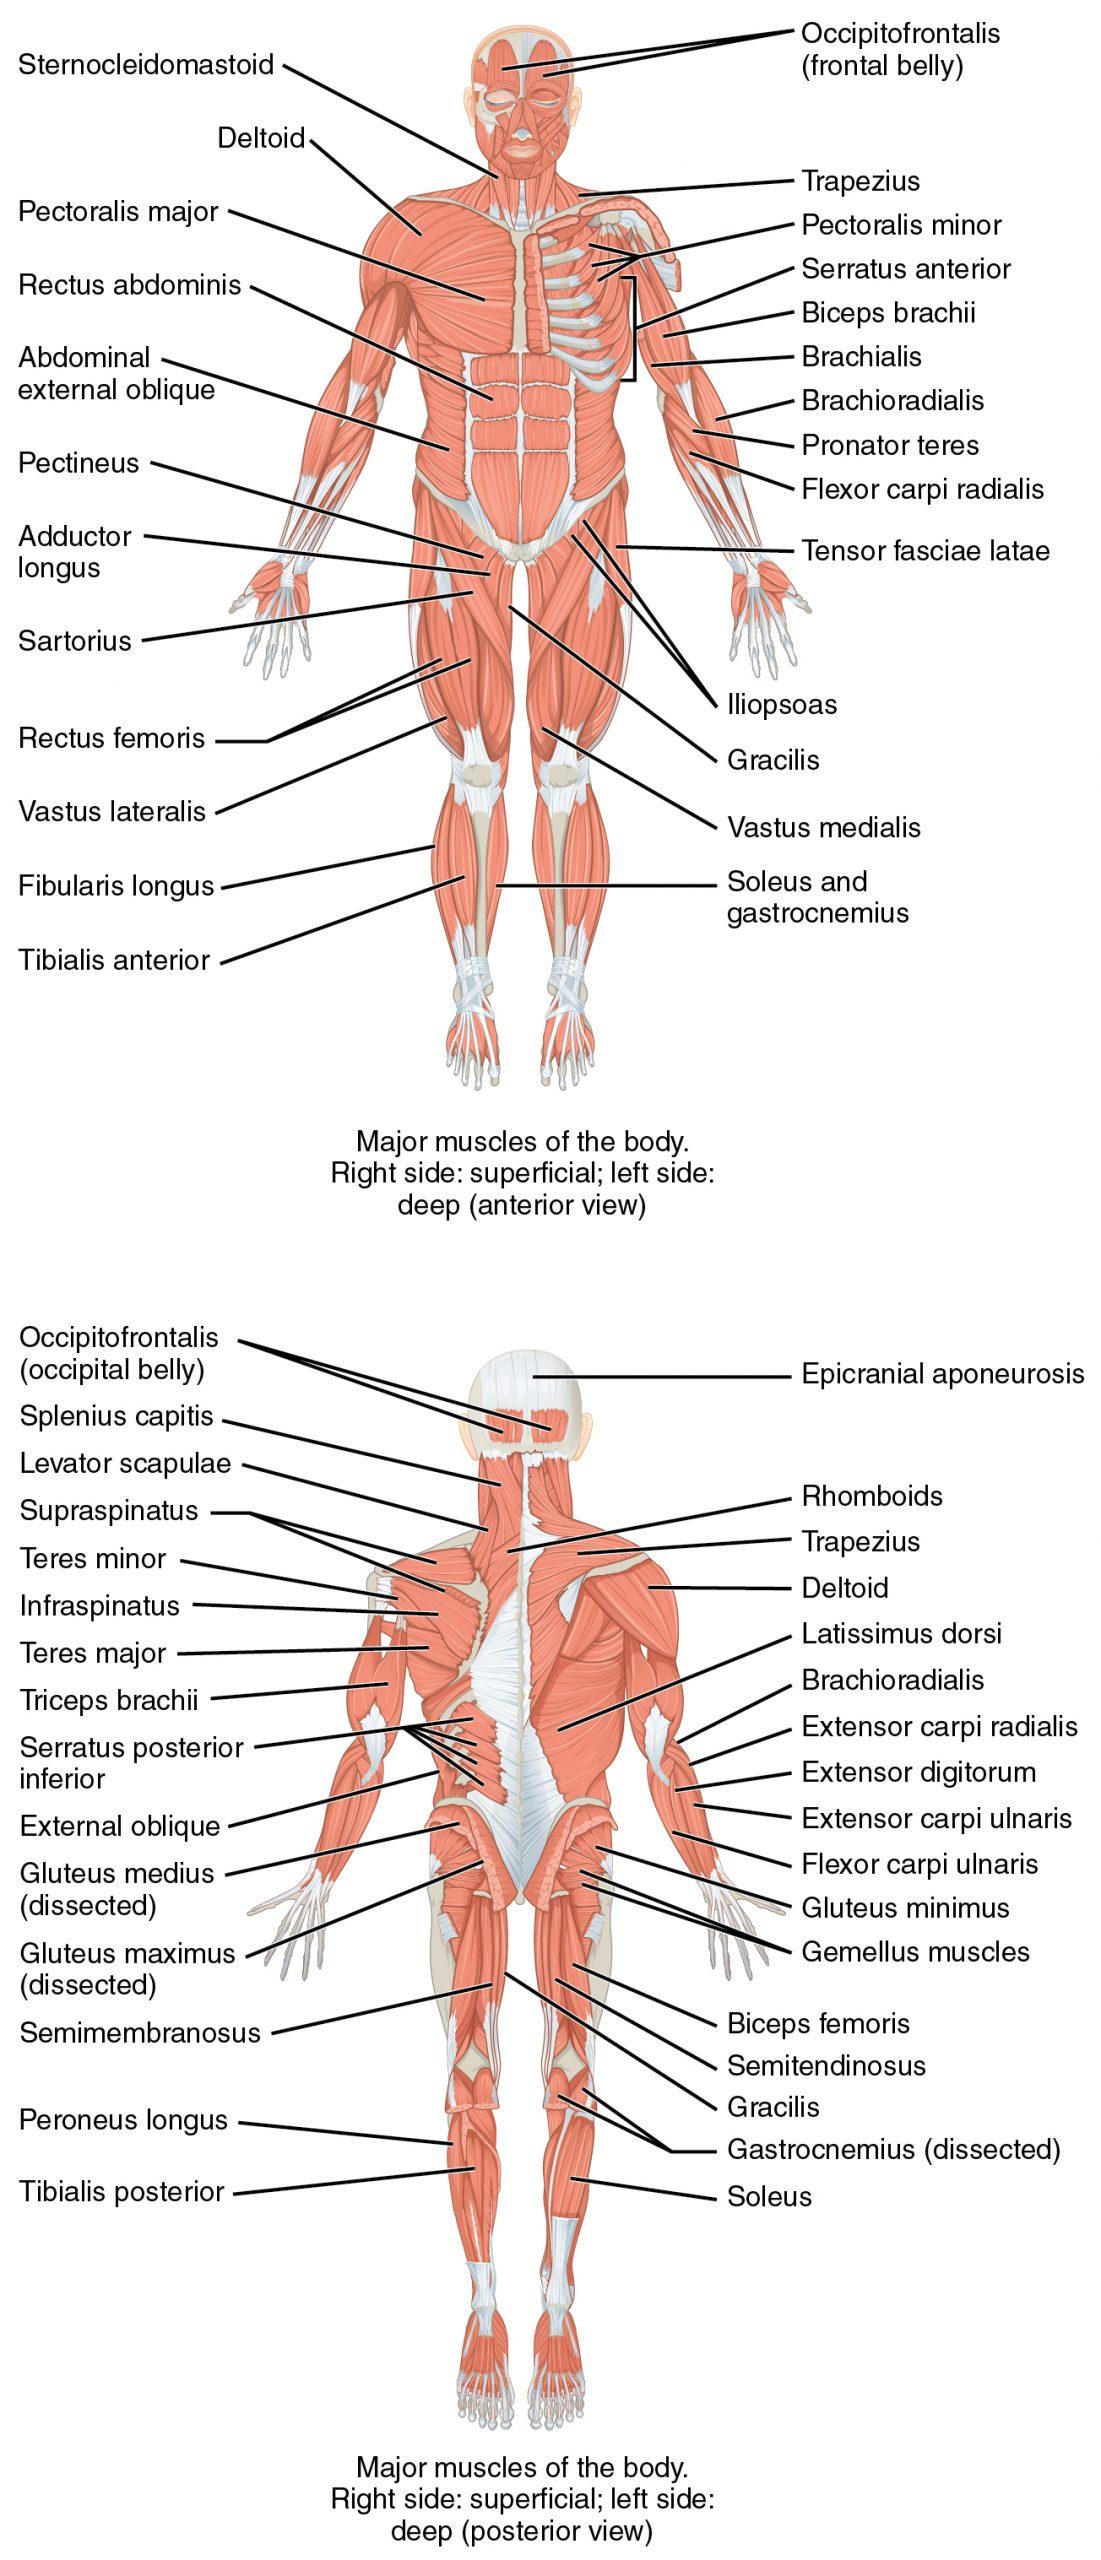 12.4.3 Major Skeletal muscles